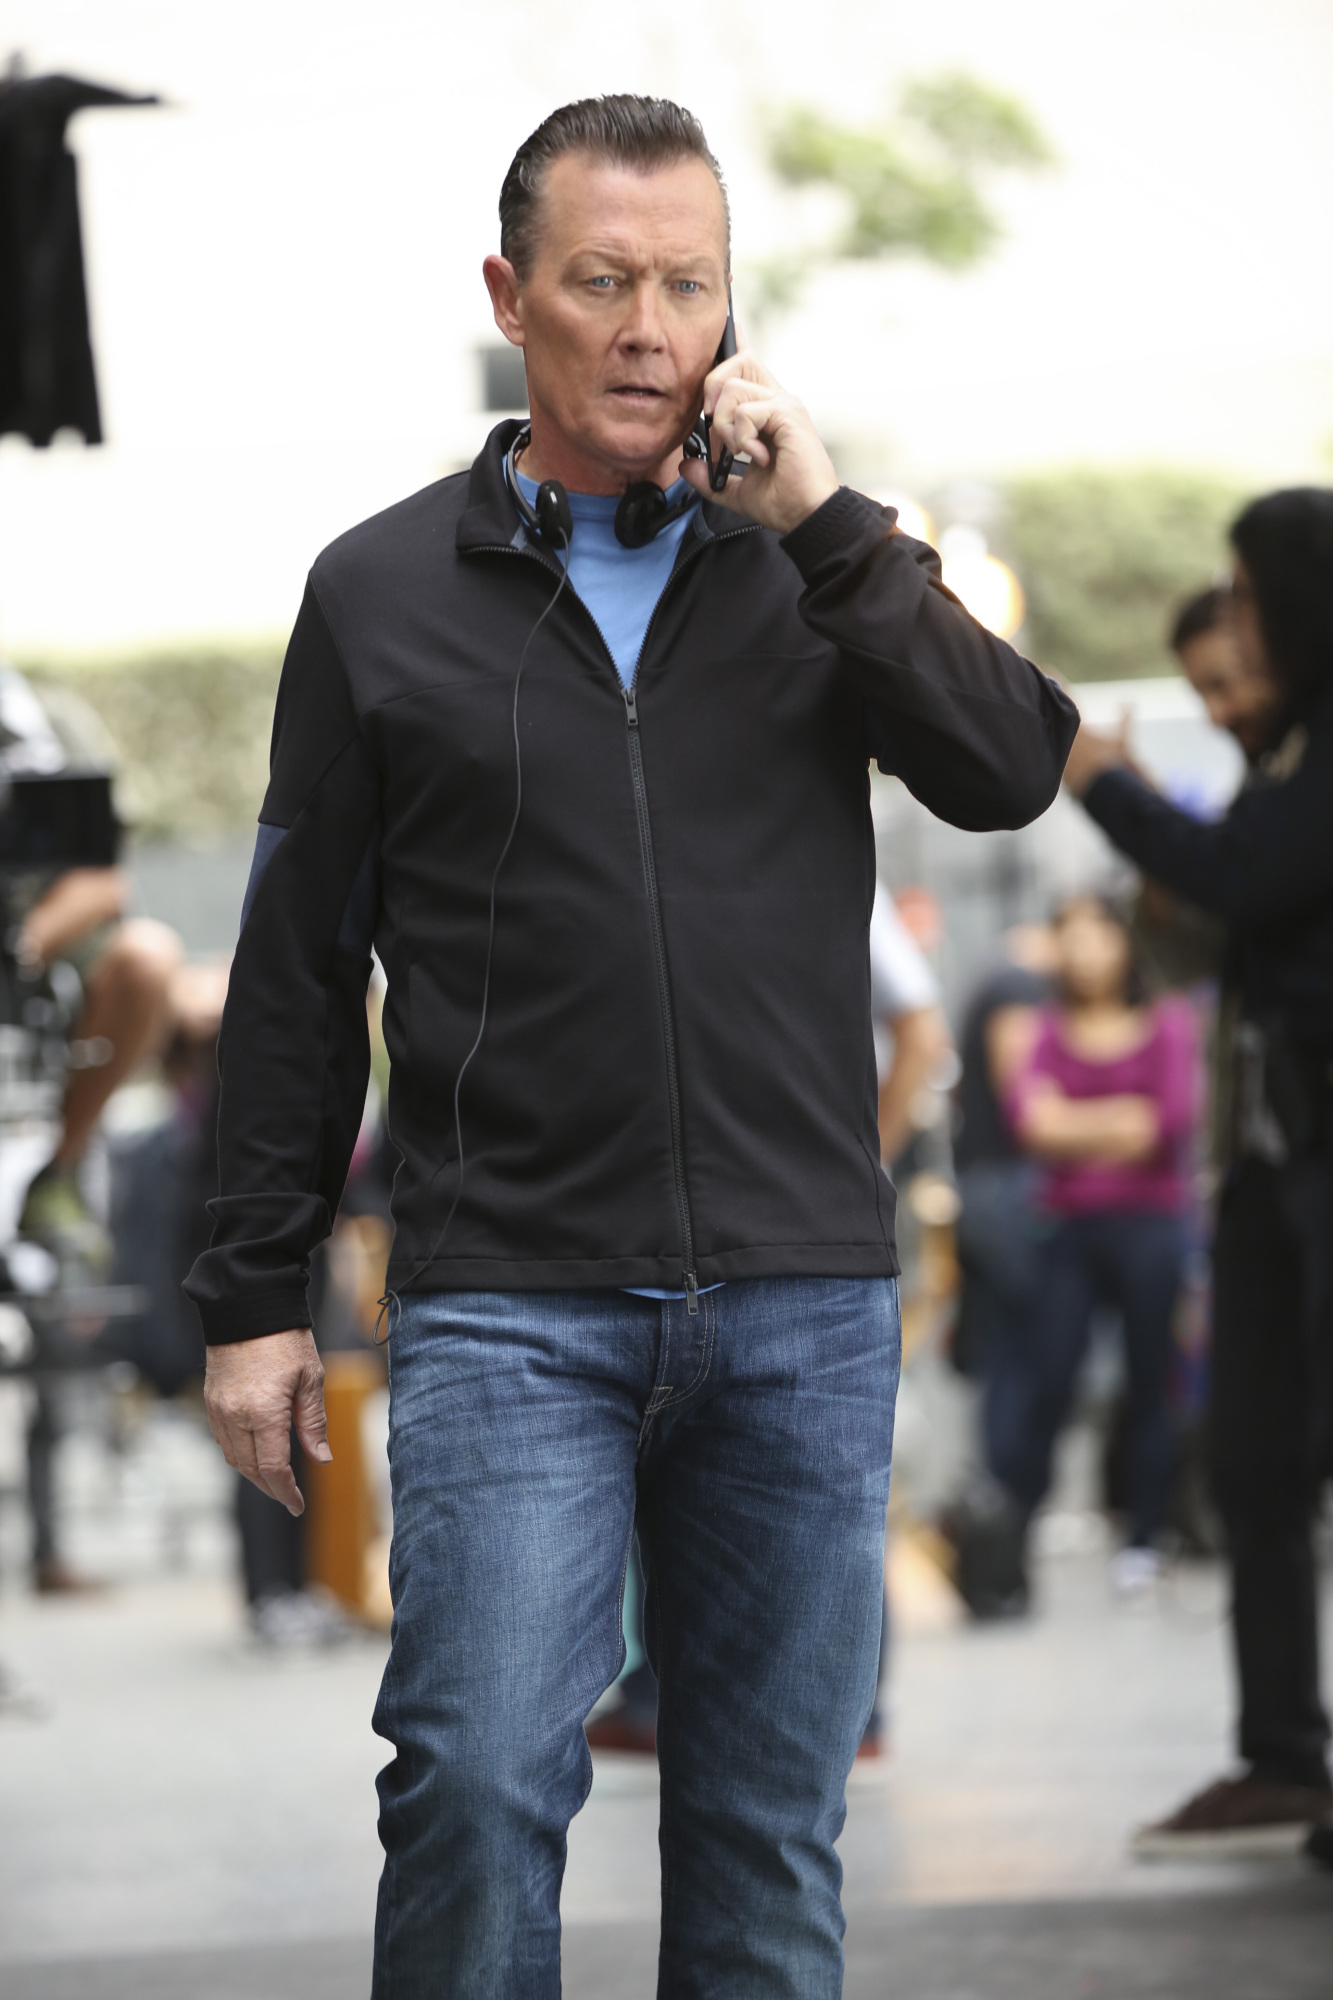 Robert Patrick as Agent Cabe Gallo